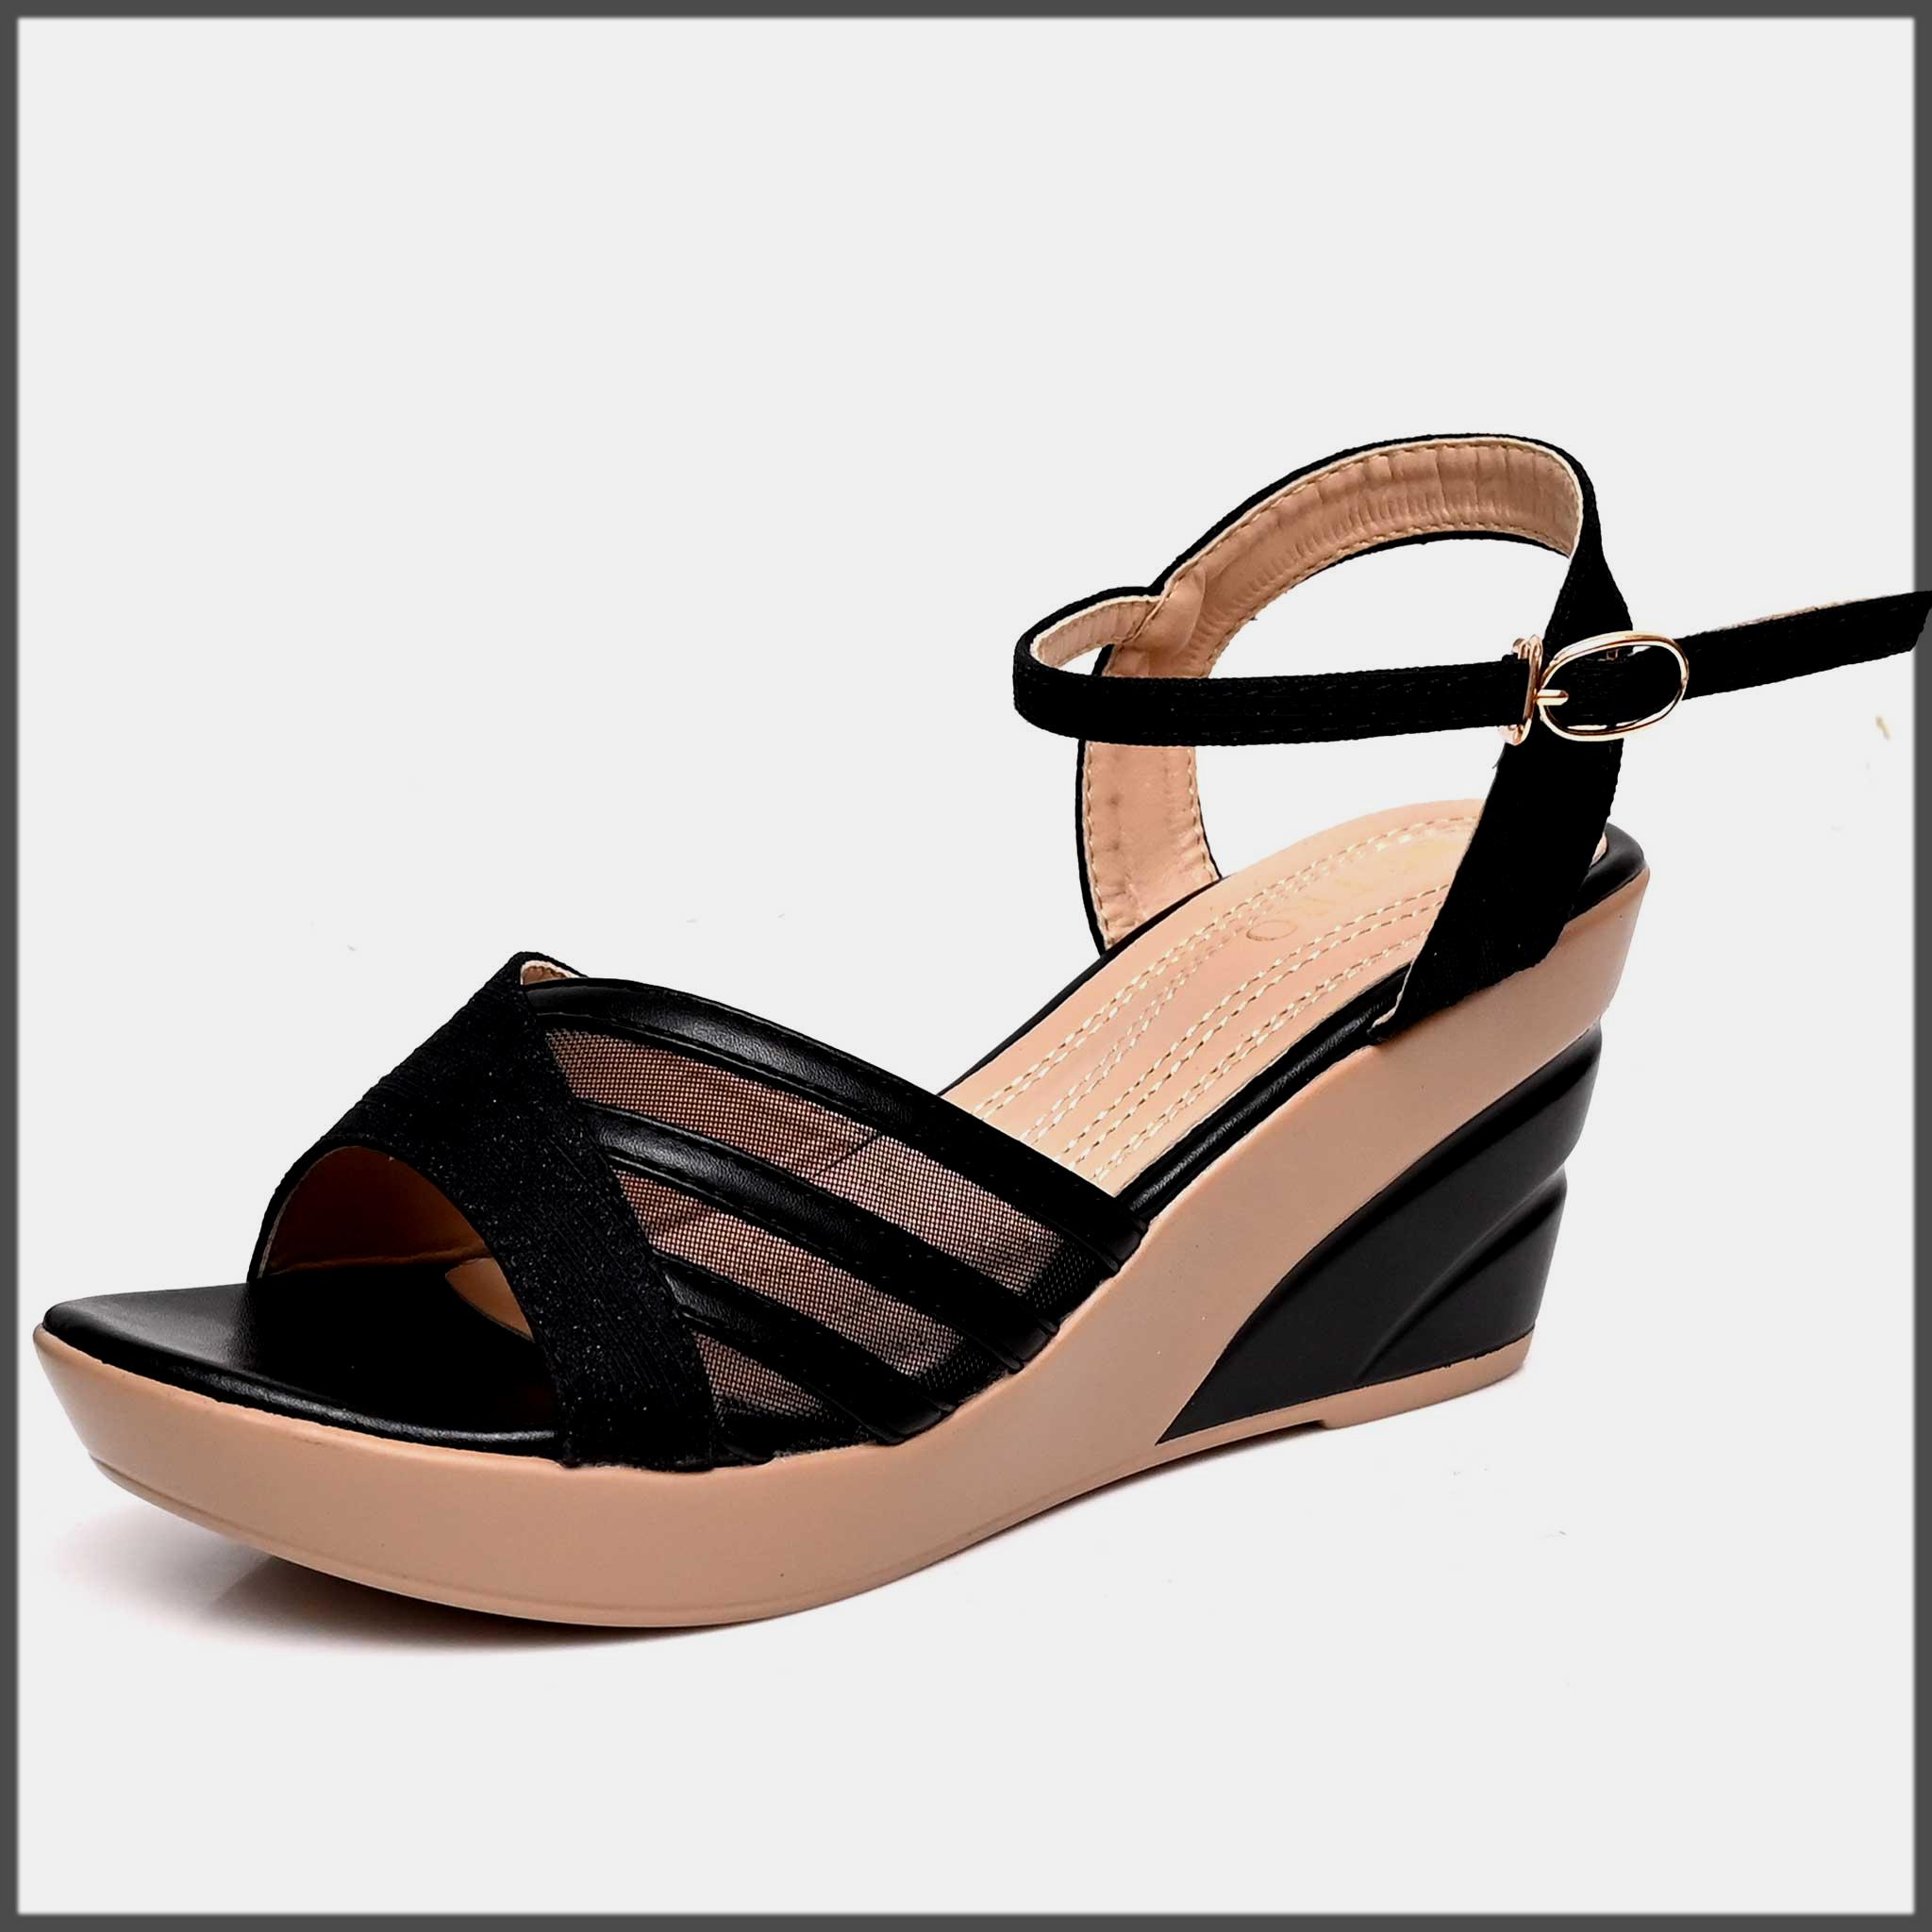 sleek black summer sandals collection